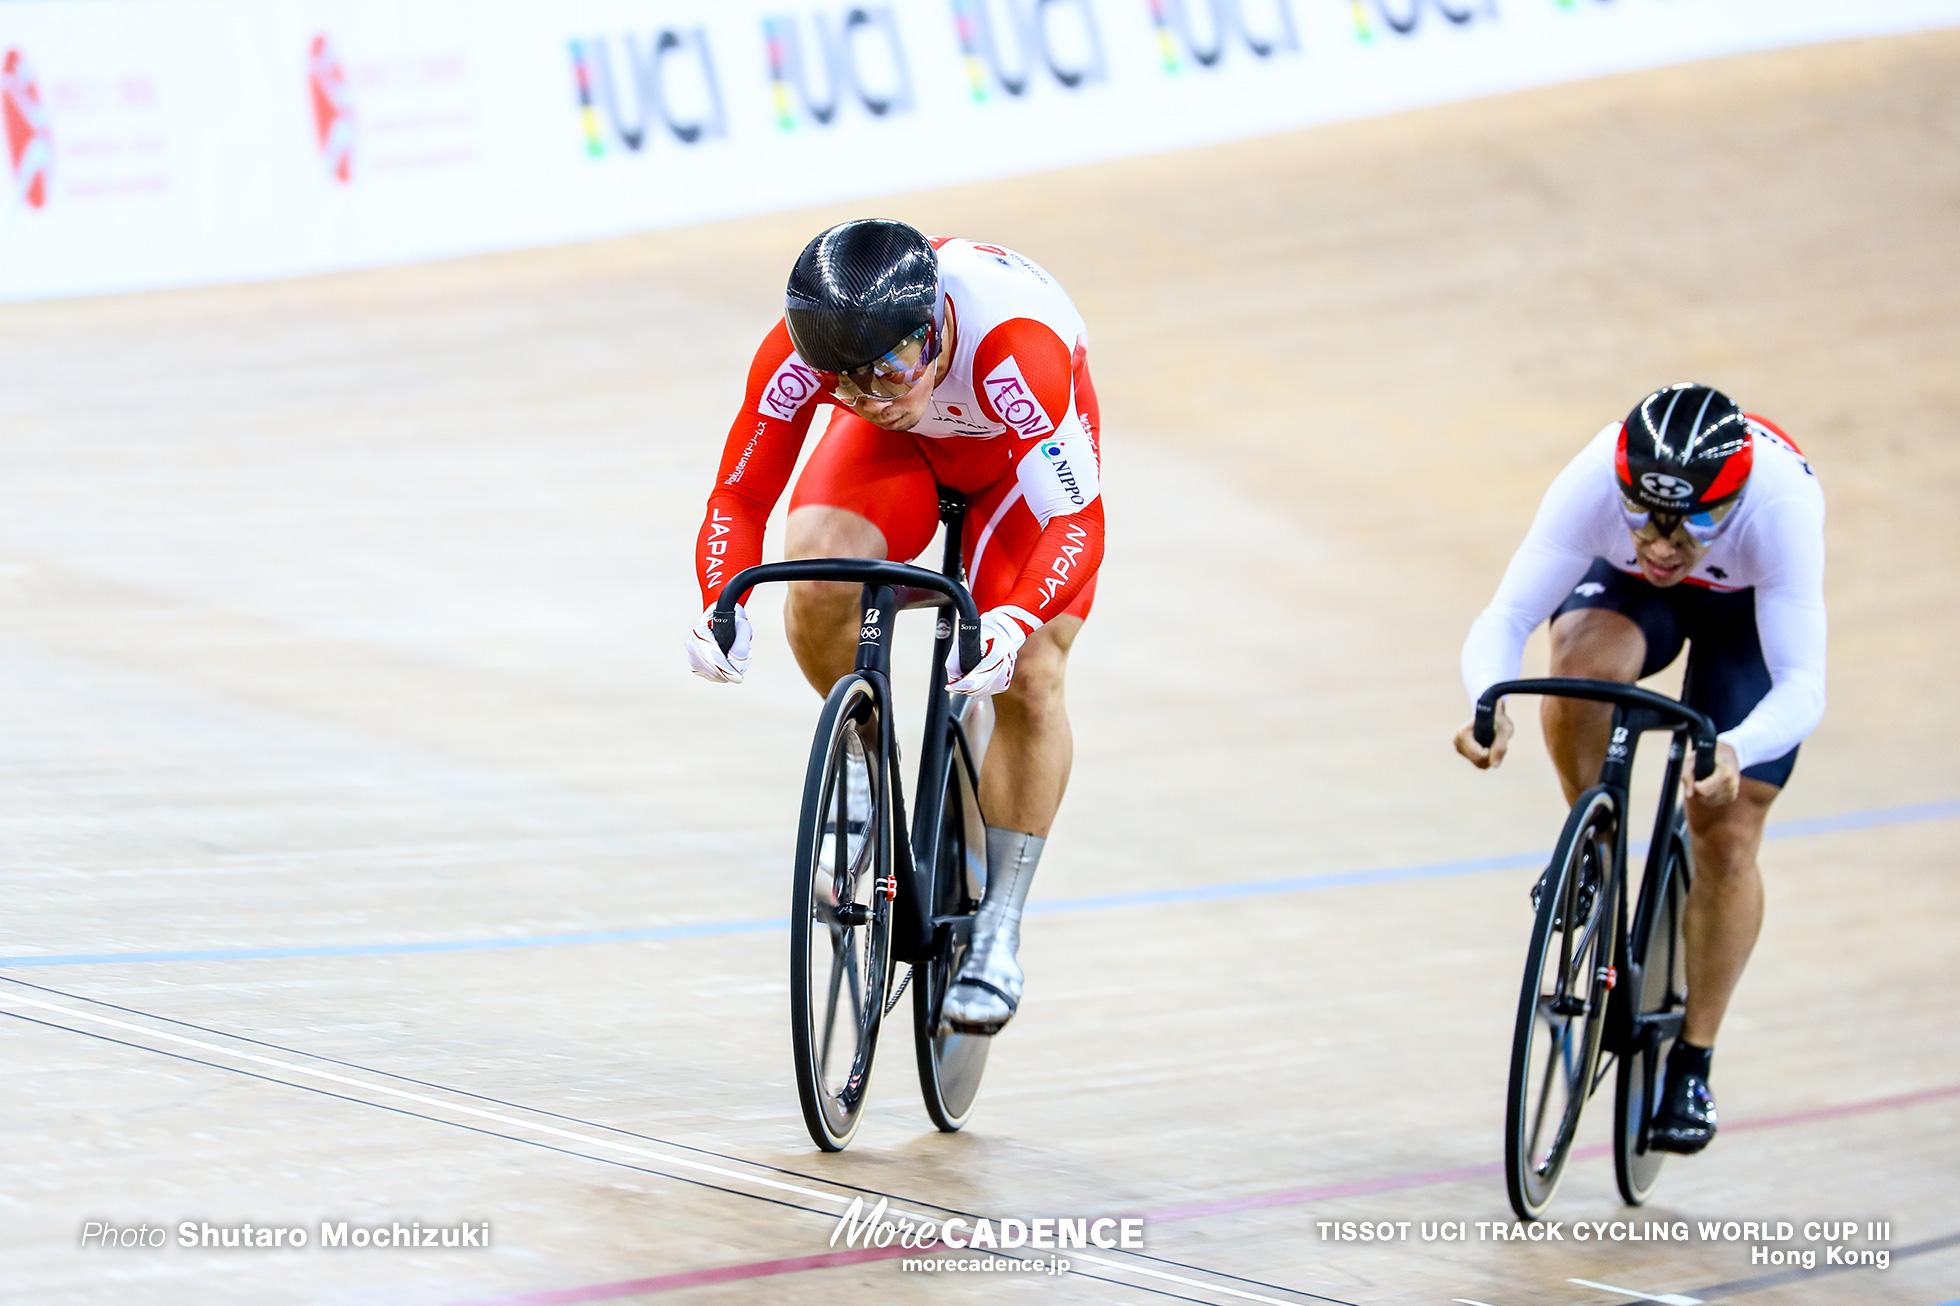 Quarter Finals / Men's Sprint / TISSOT UCI TRACK CYCLING WORLD CUP III, Hong Kong